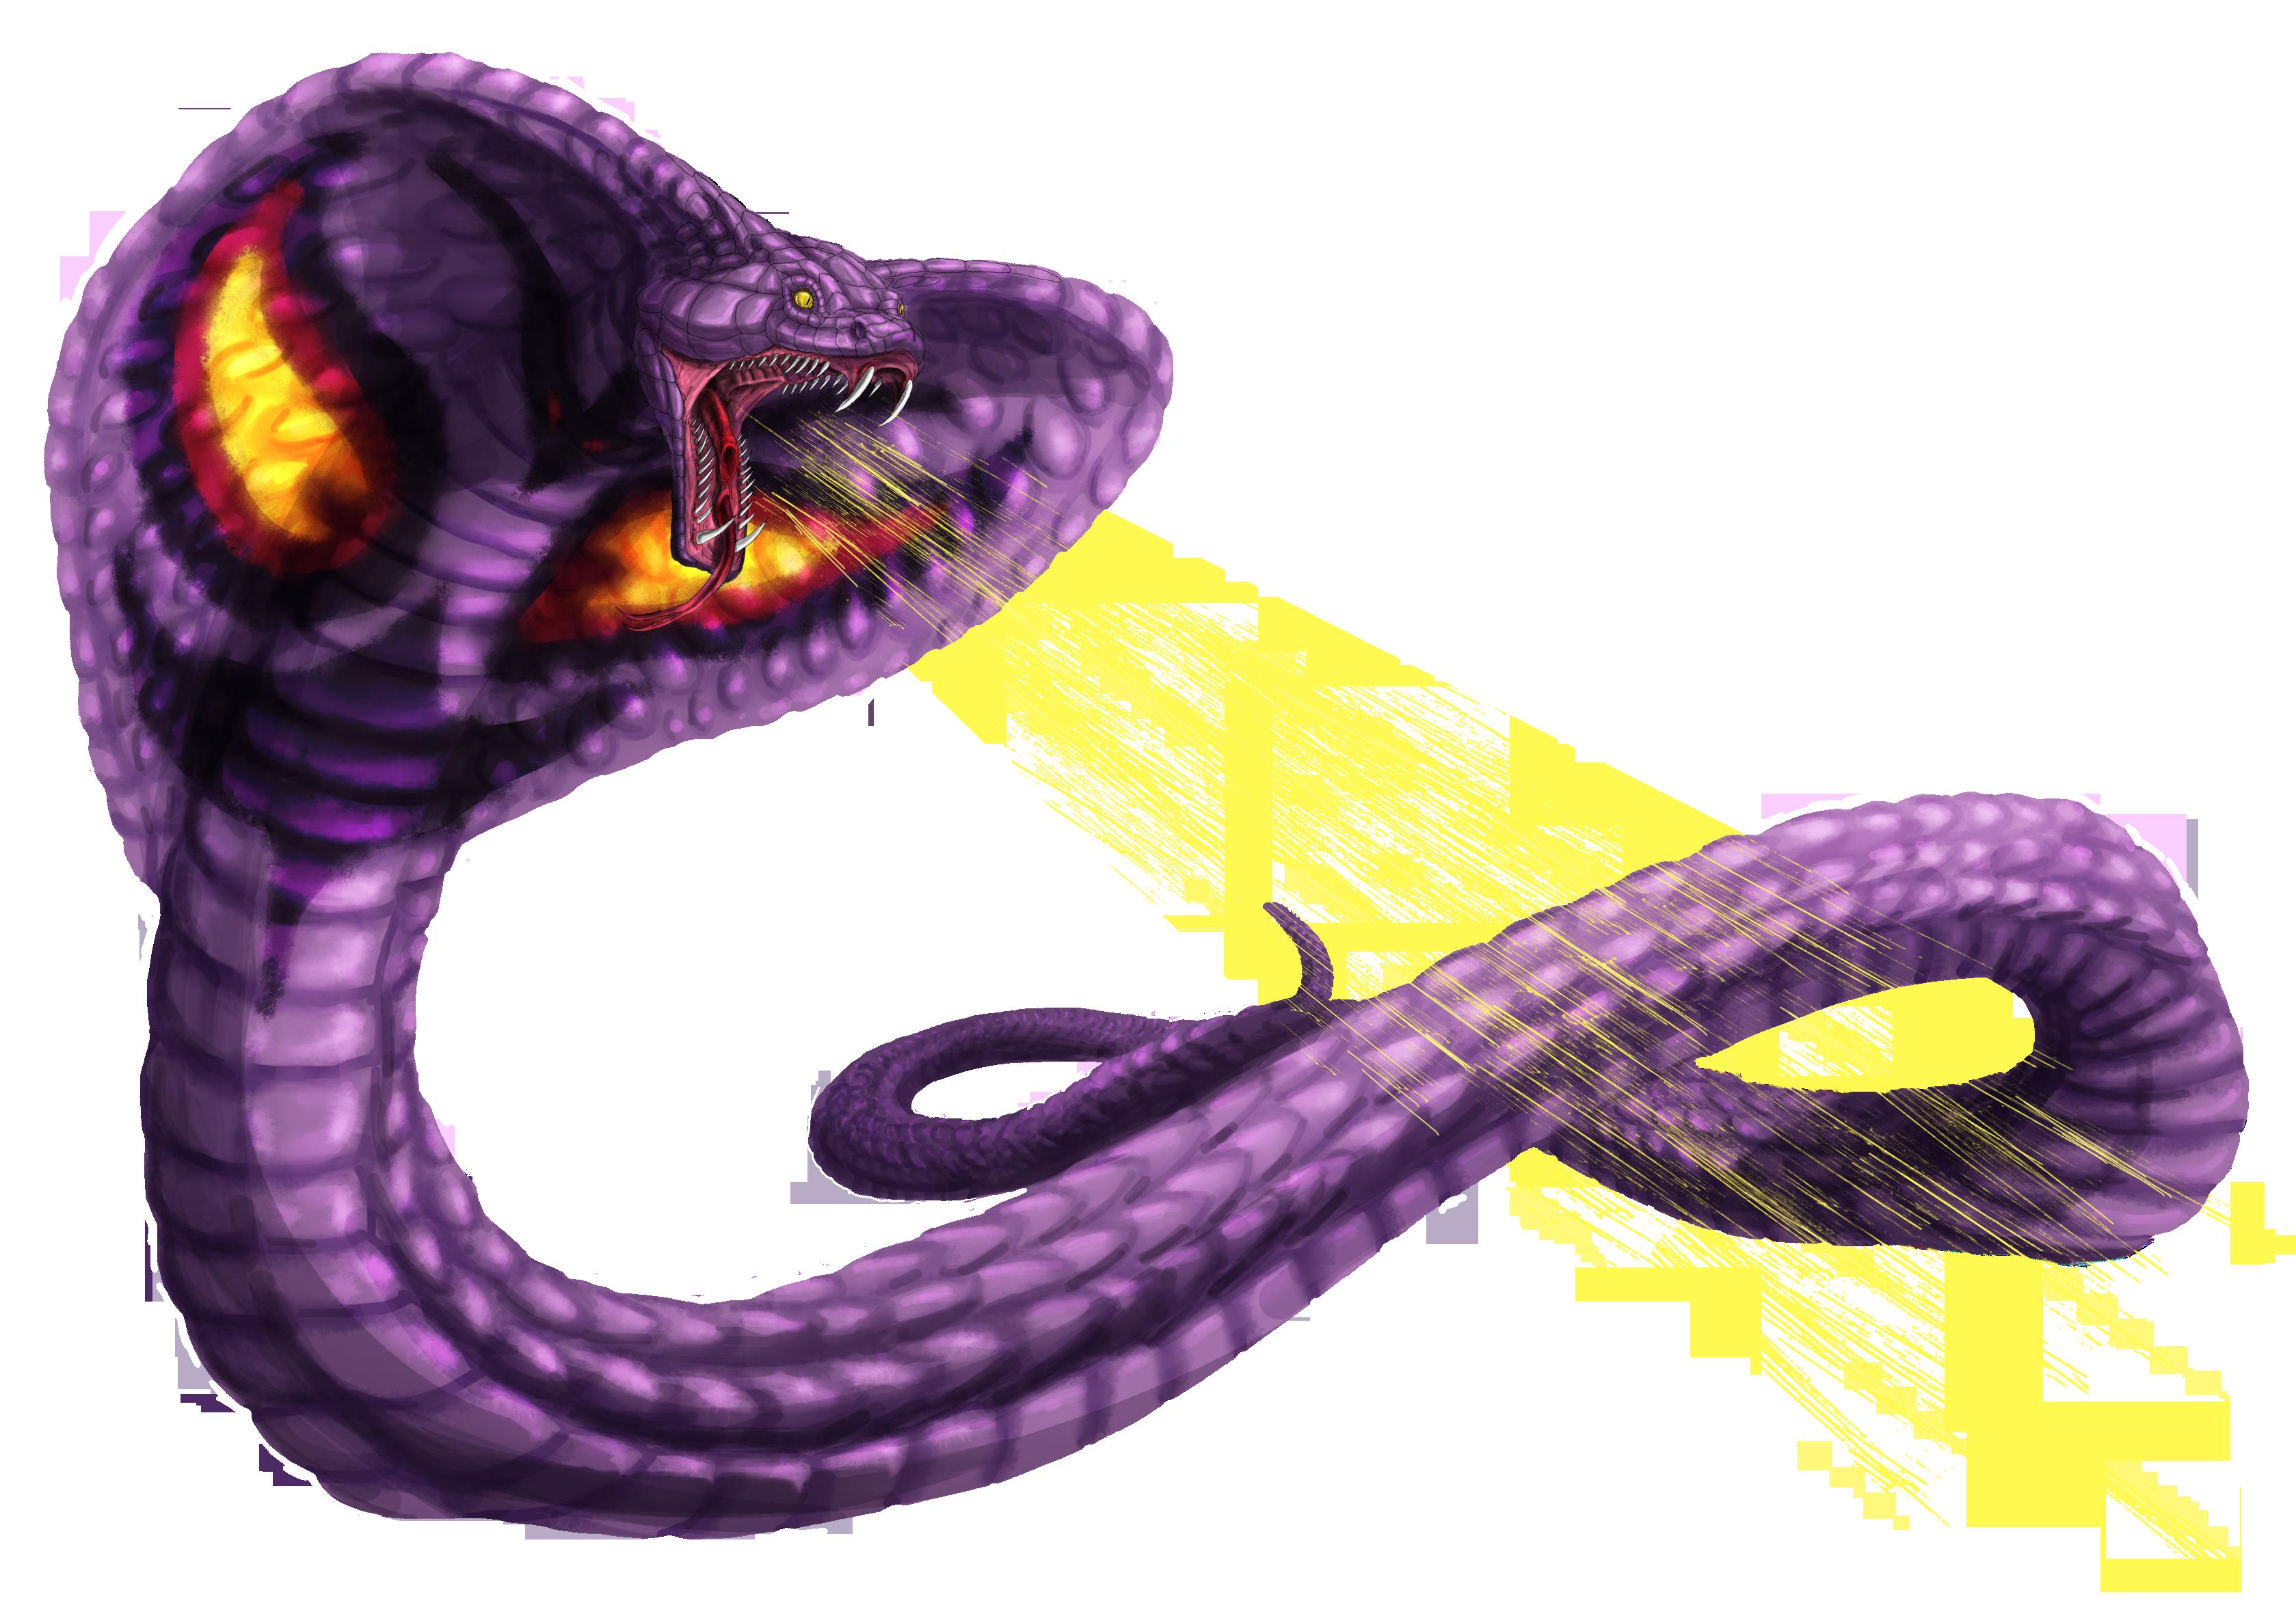 arbok used thunder. Cobra clipart fang